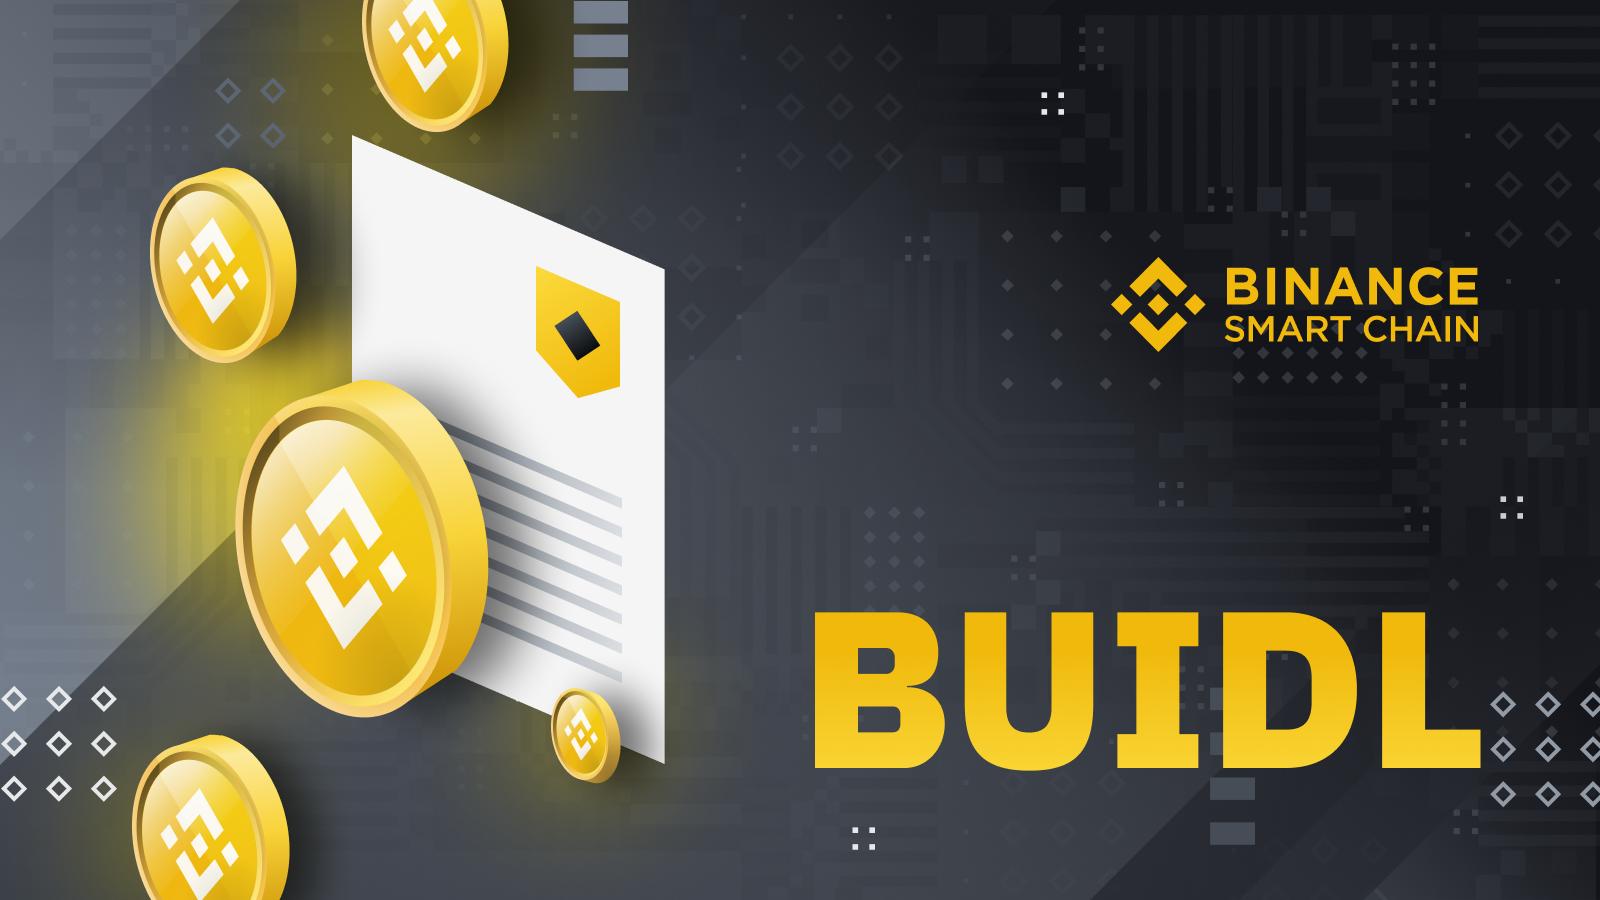 BUIDL Reward Program Updates with $1.2 Million Dollar Distributed as April Reward